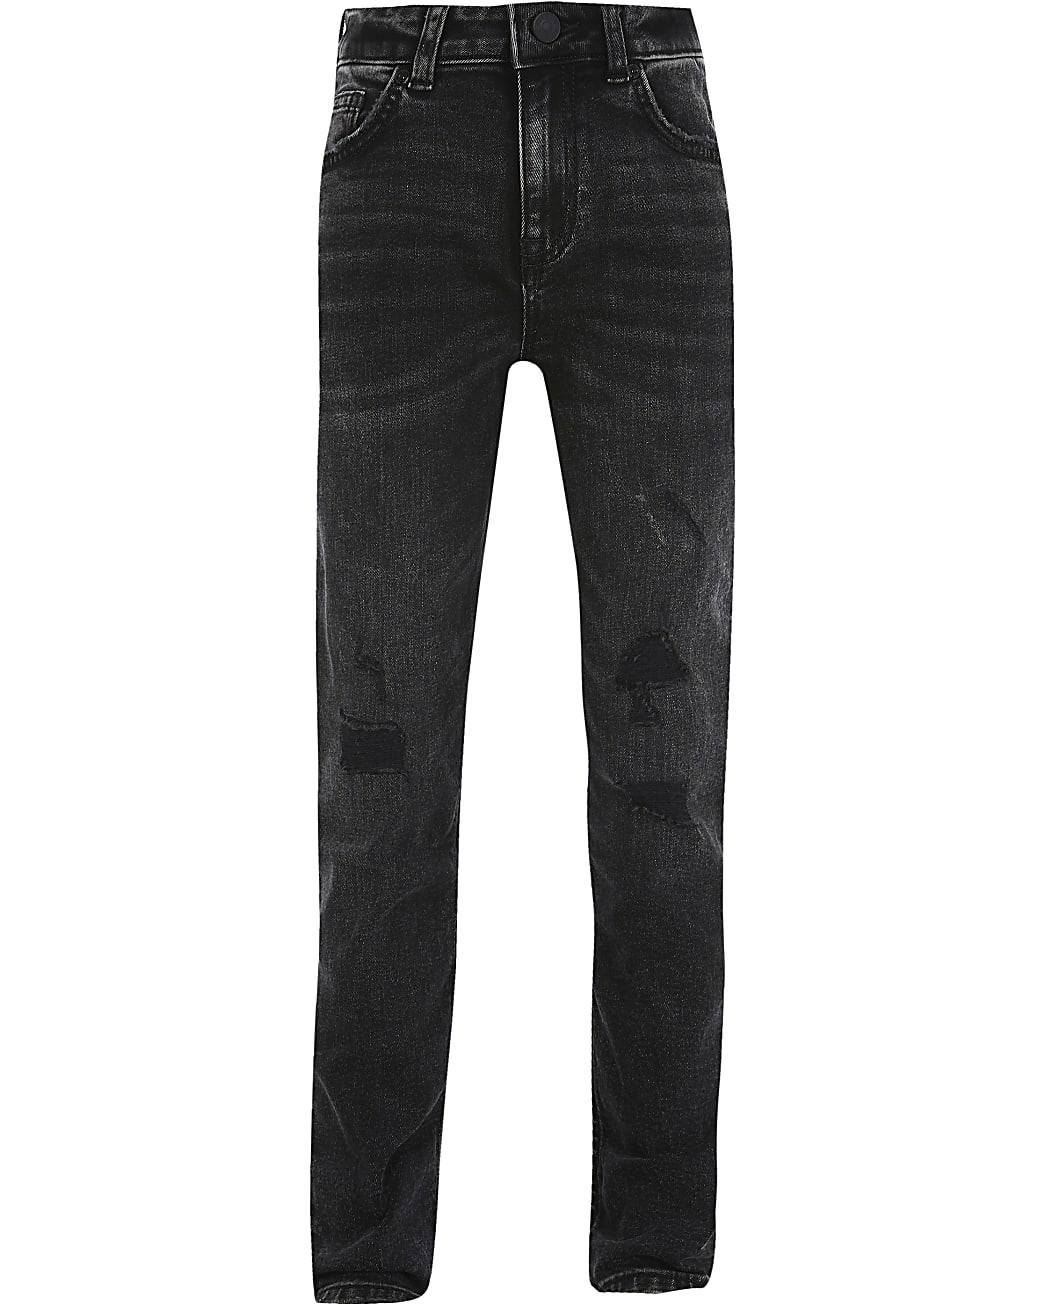 Boys black wash regular slim jeans